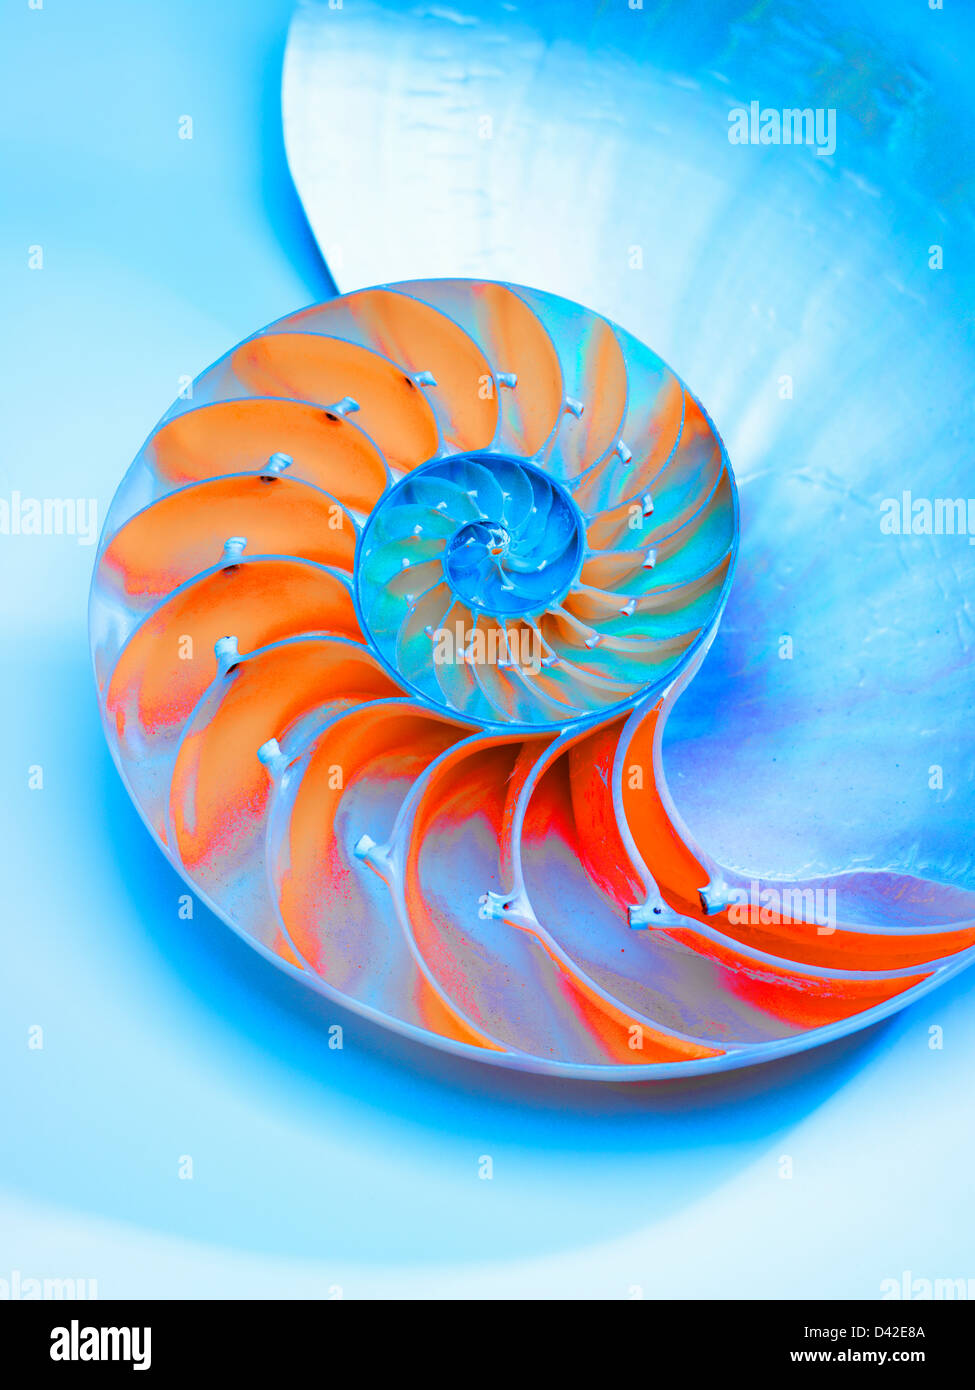 Shell Nautilus atravesada en la mitad mostrando las salas,Nautilus Nautilus Pompilus,Género Imagen De Stock